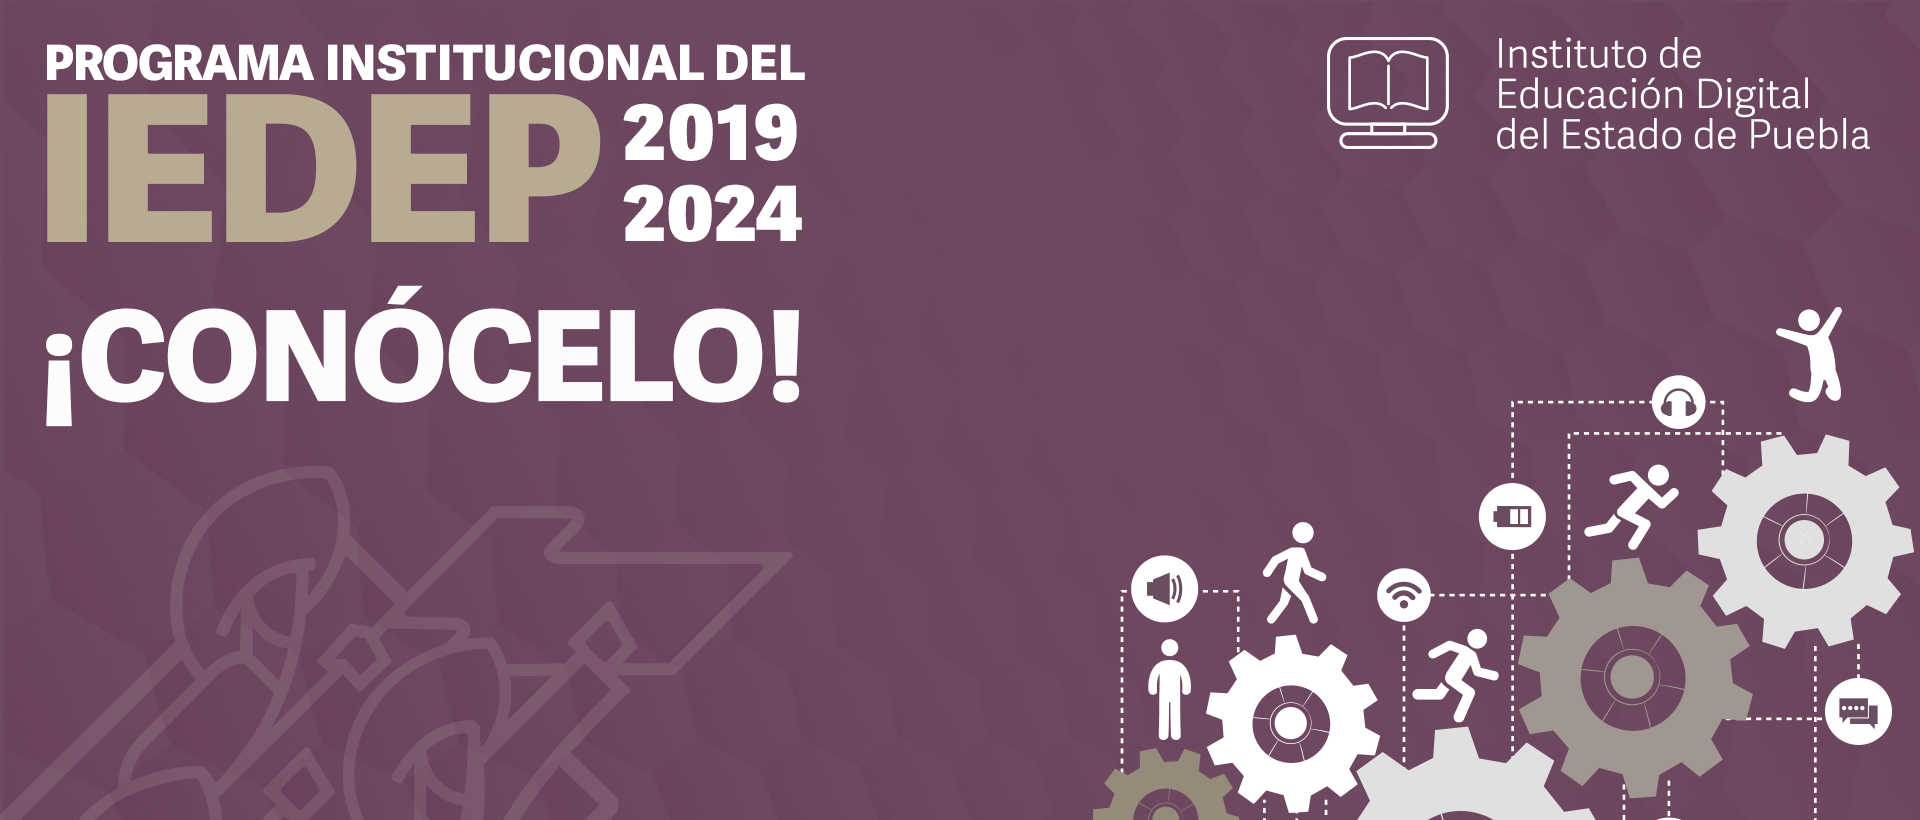 Programa_Institucional2019-2024-banner.jpg